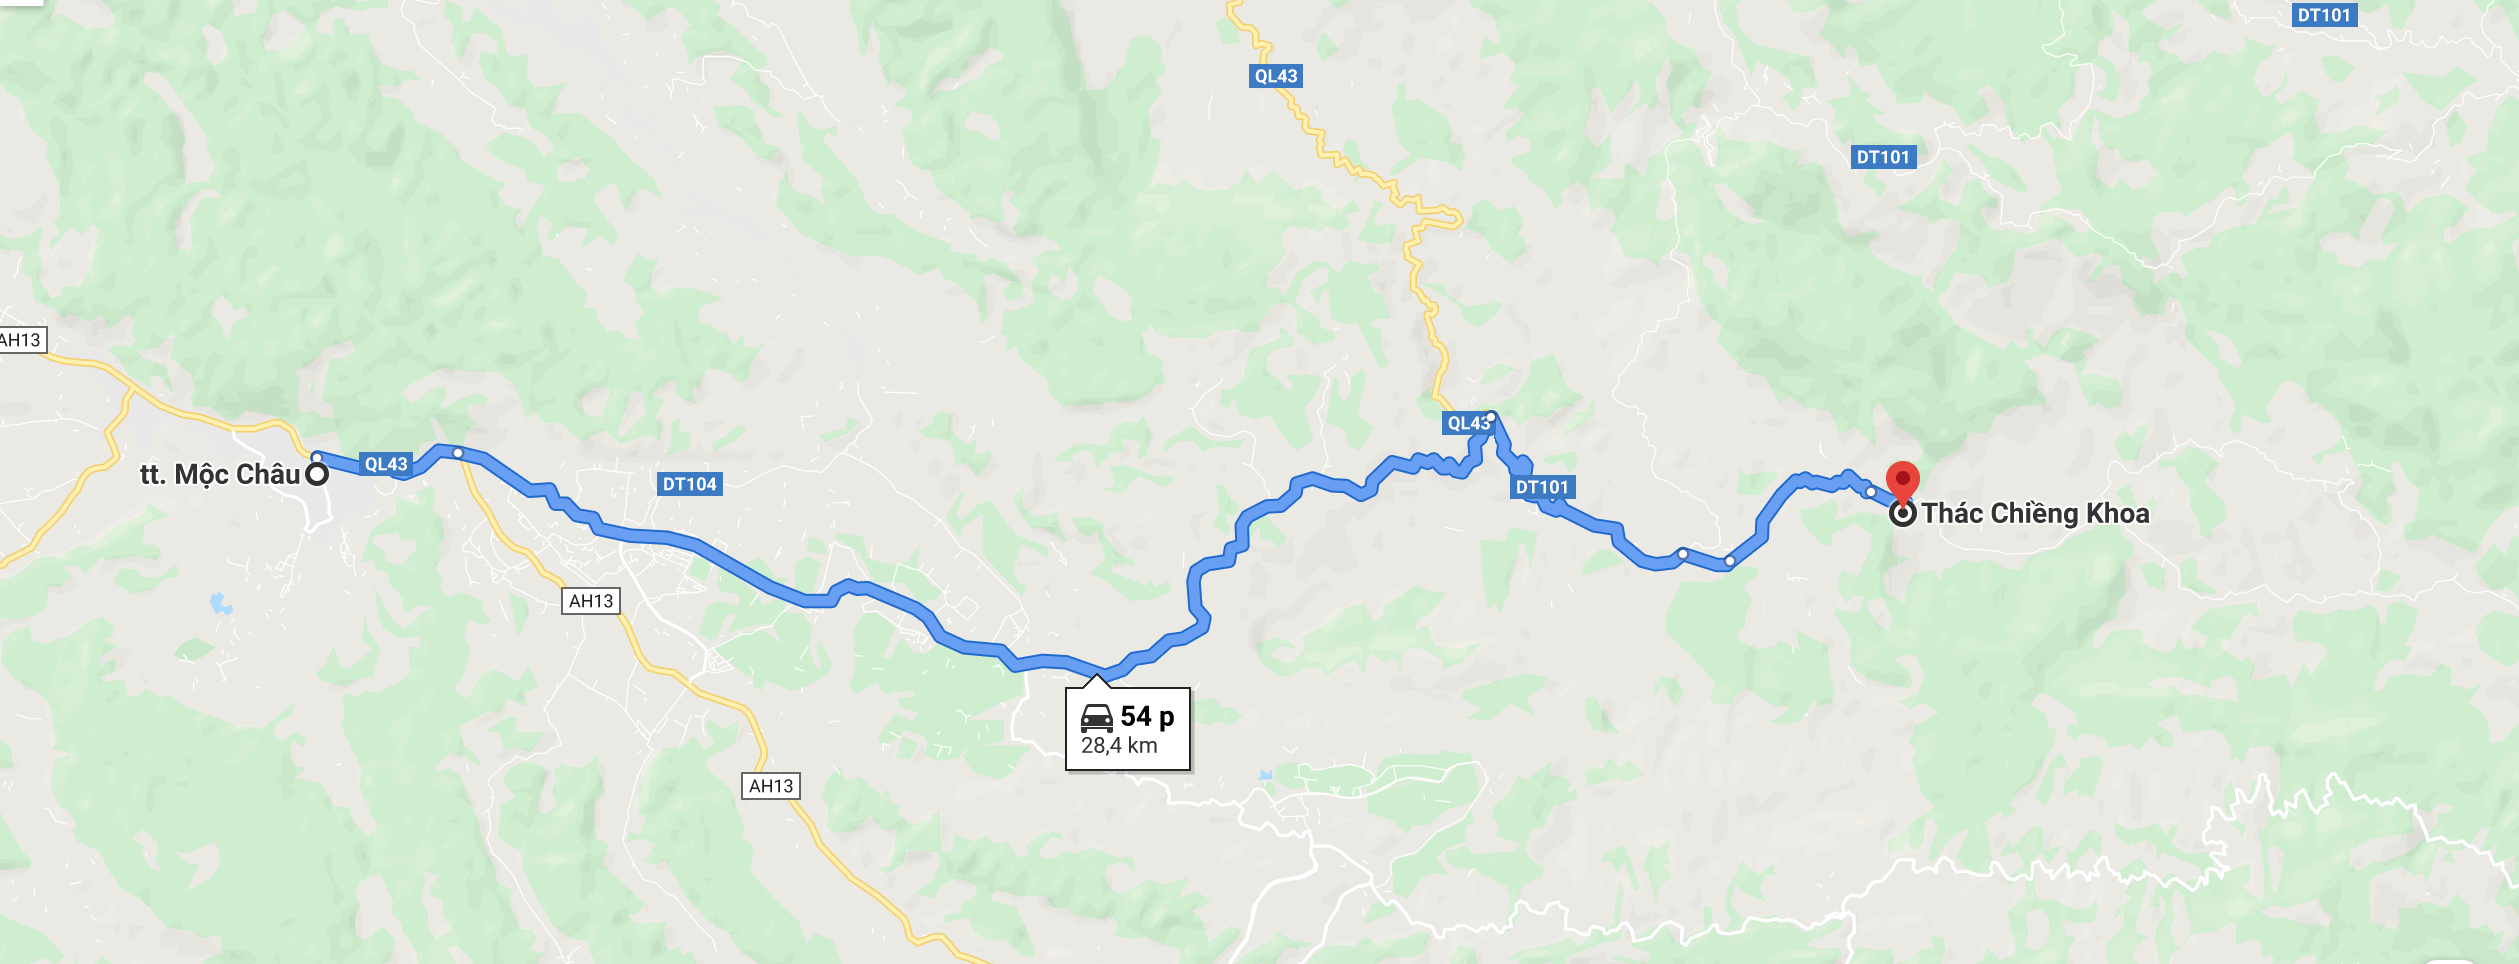 Kinh-nghiem-du-lich-thac-Chieng-Khoa-nang-tho-cua-Moc-Chau-2